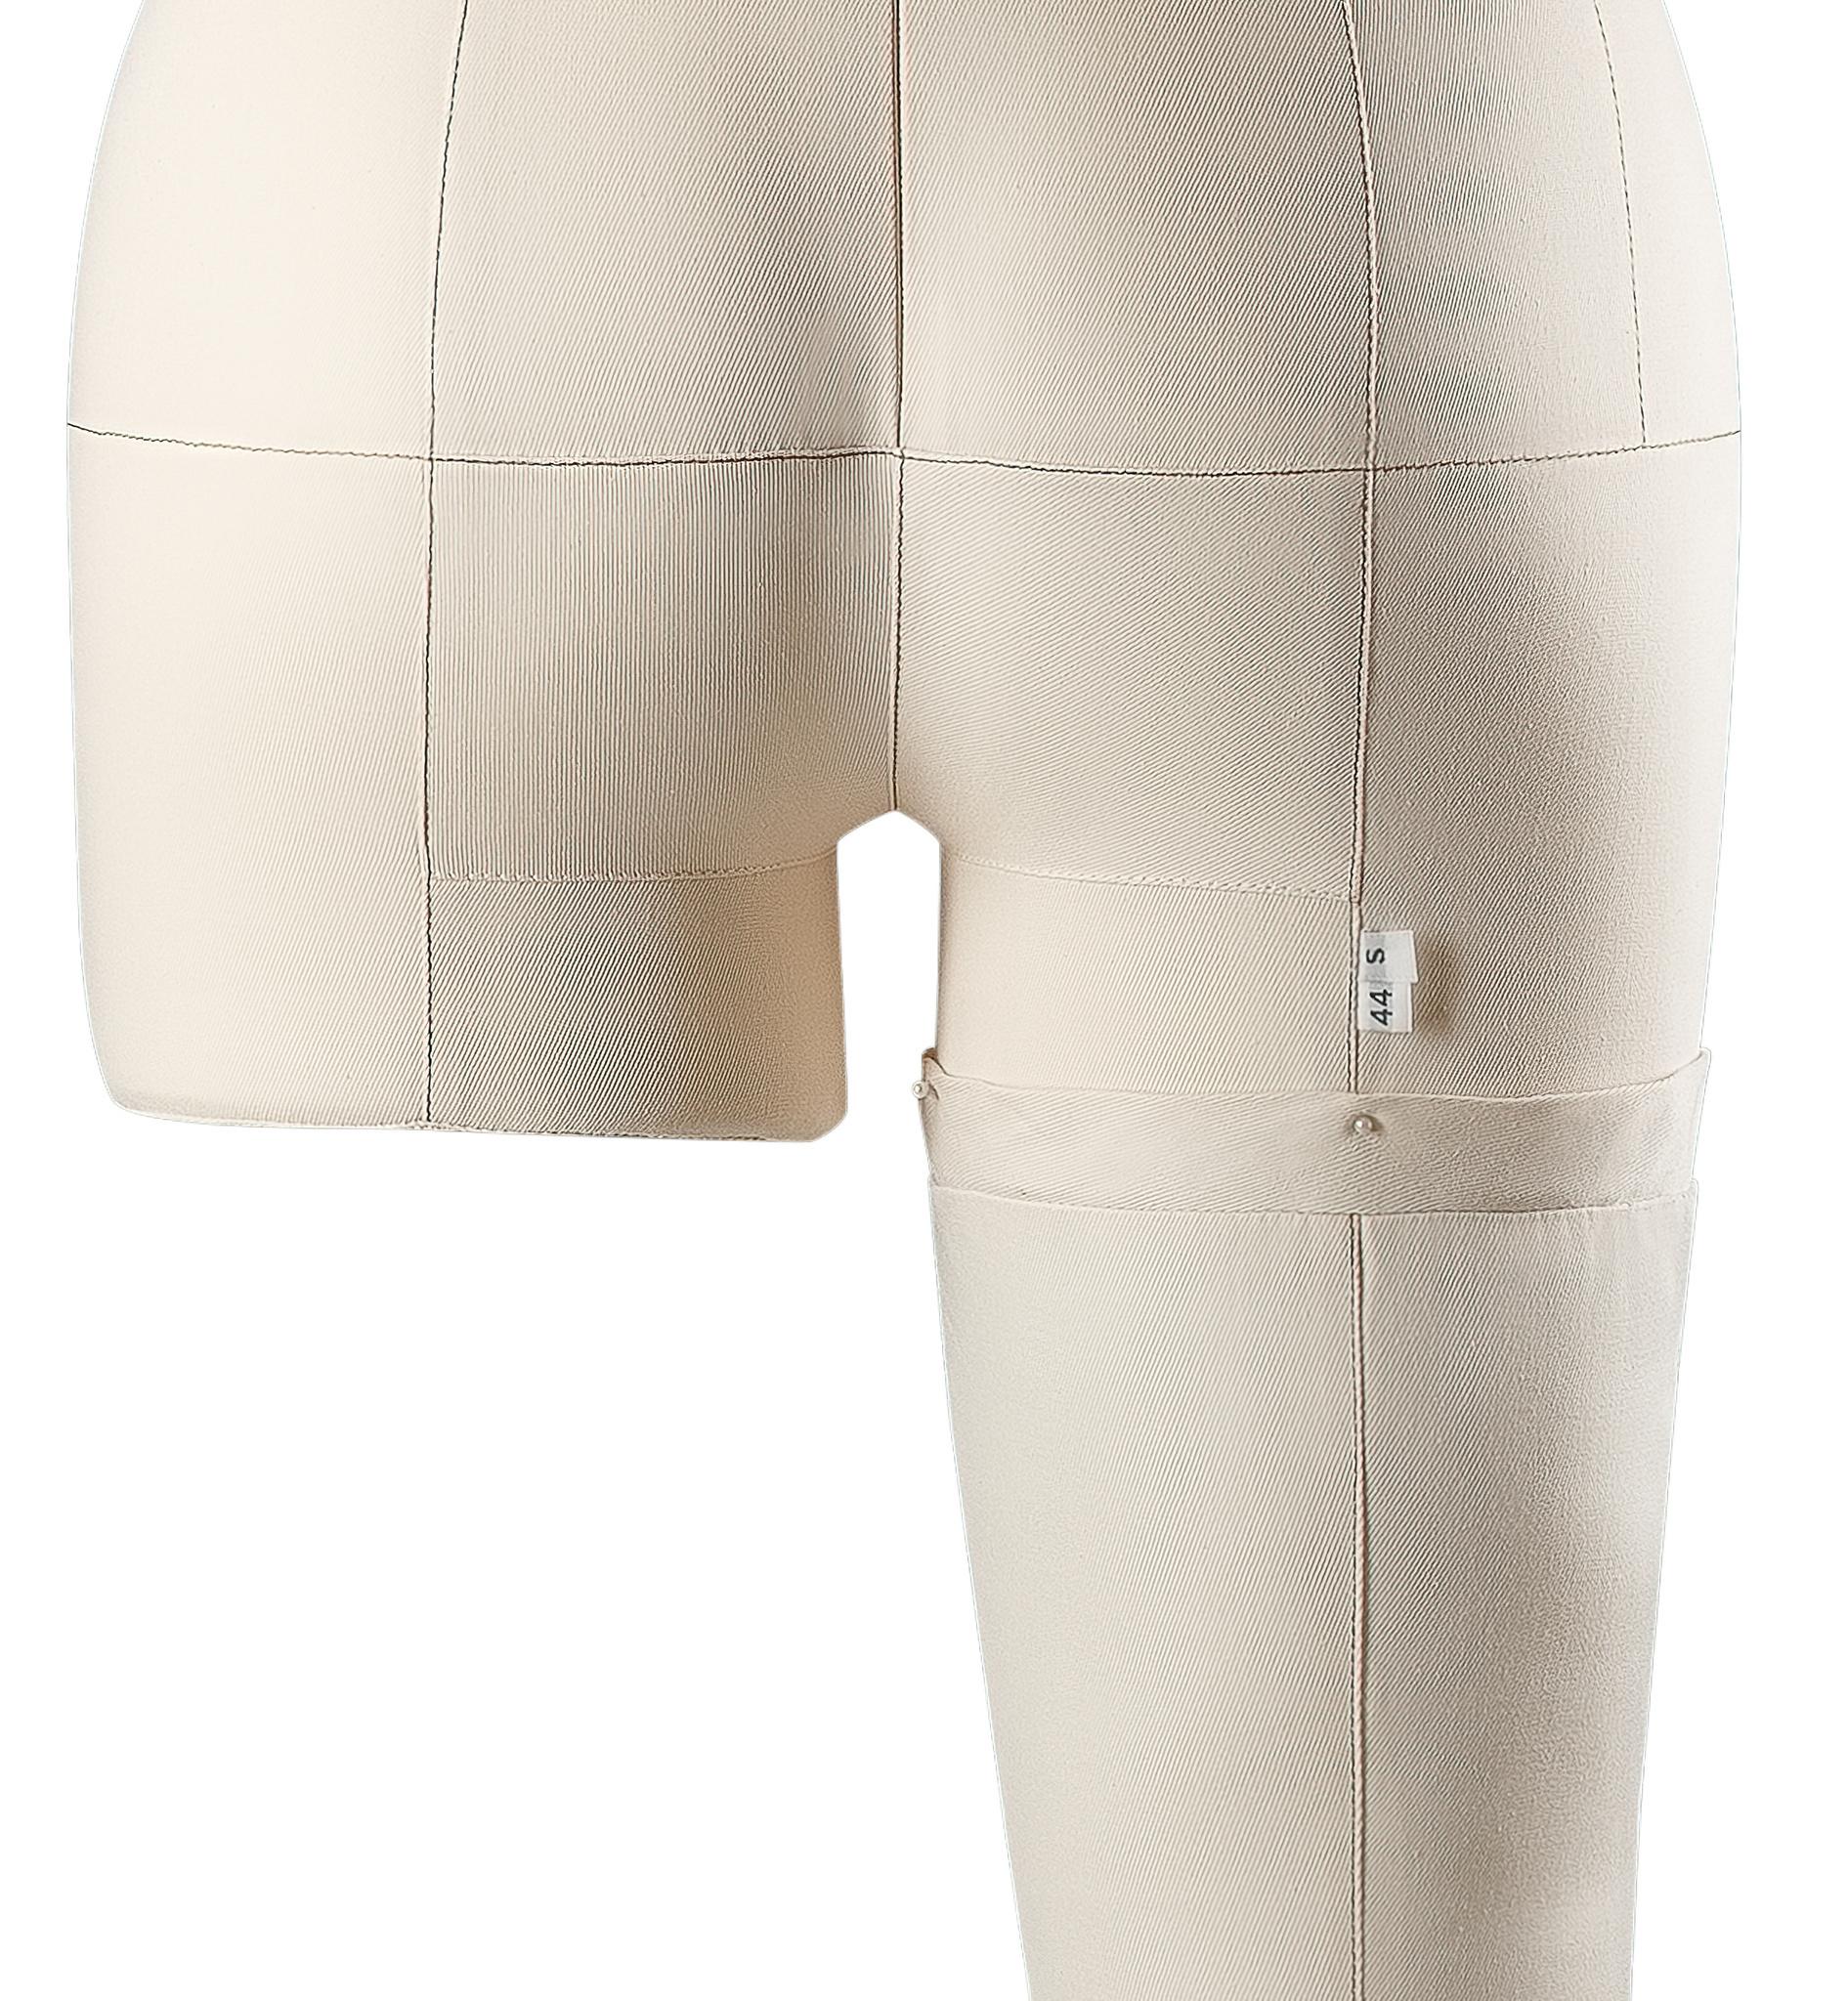 Нога для манекена Моника, размер 44 тип фигуры Прямоугольник, бежеваяФото 1